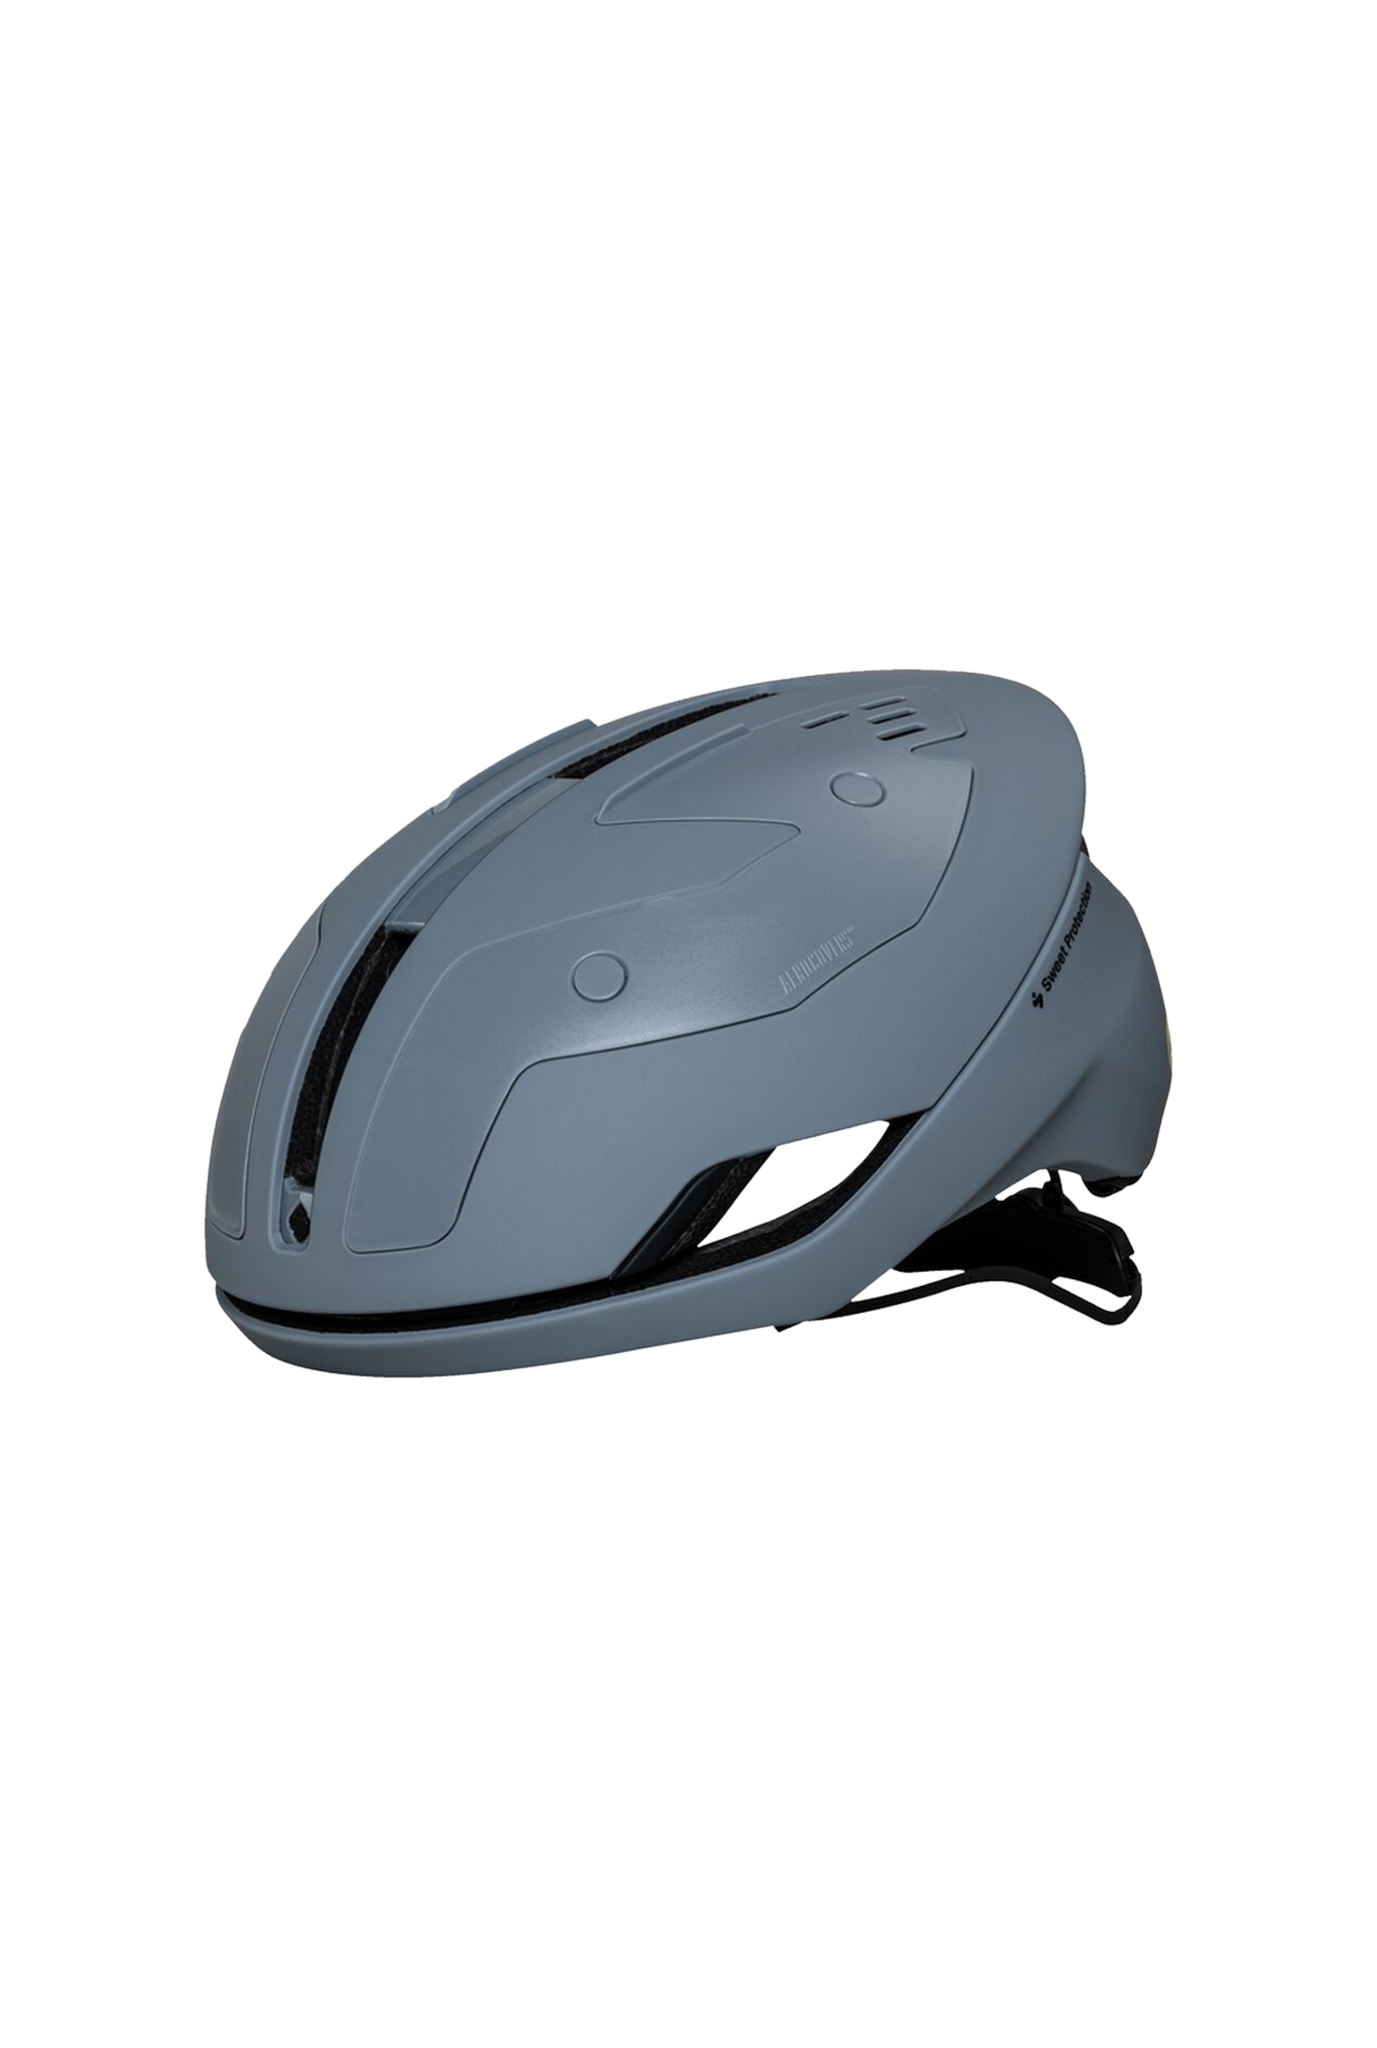 Falconer II Aero MIPS Helmet Matte Nardo Grey Large-1